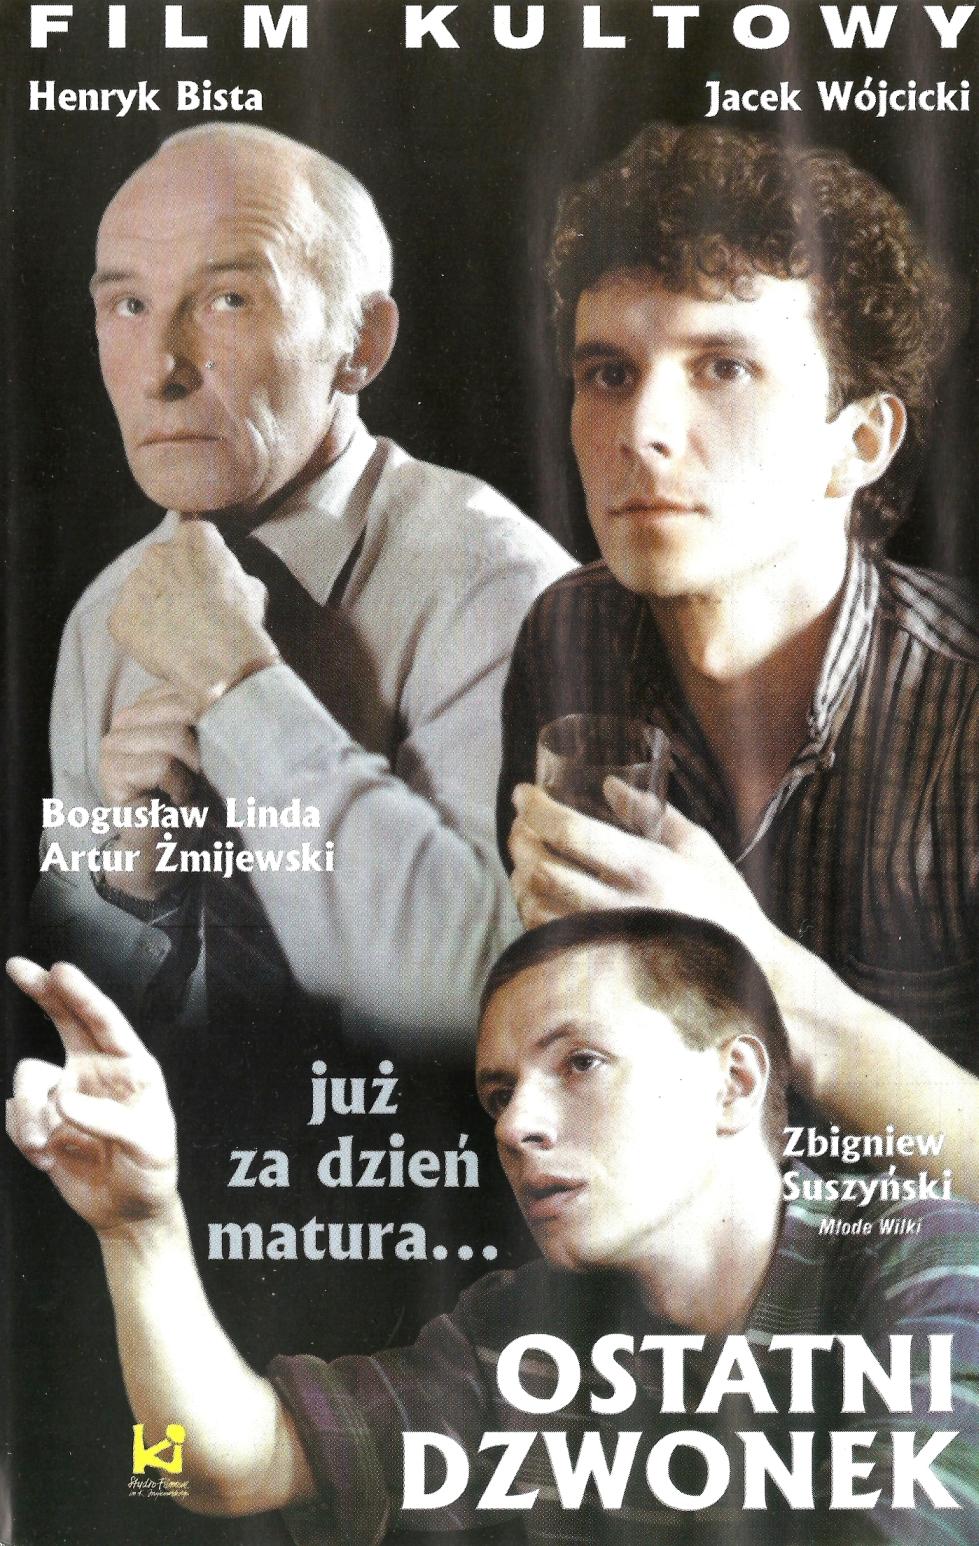 Ostatni dzwonek (1989)